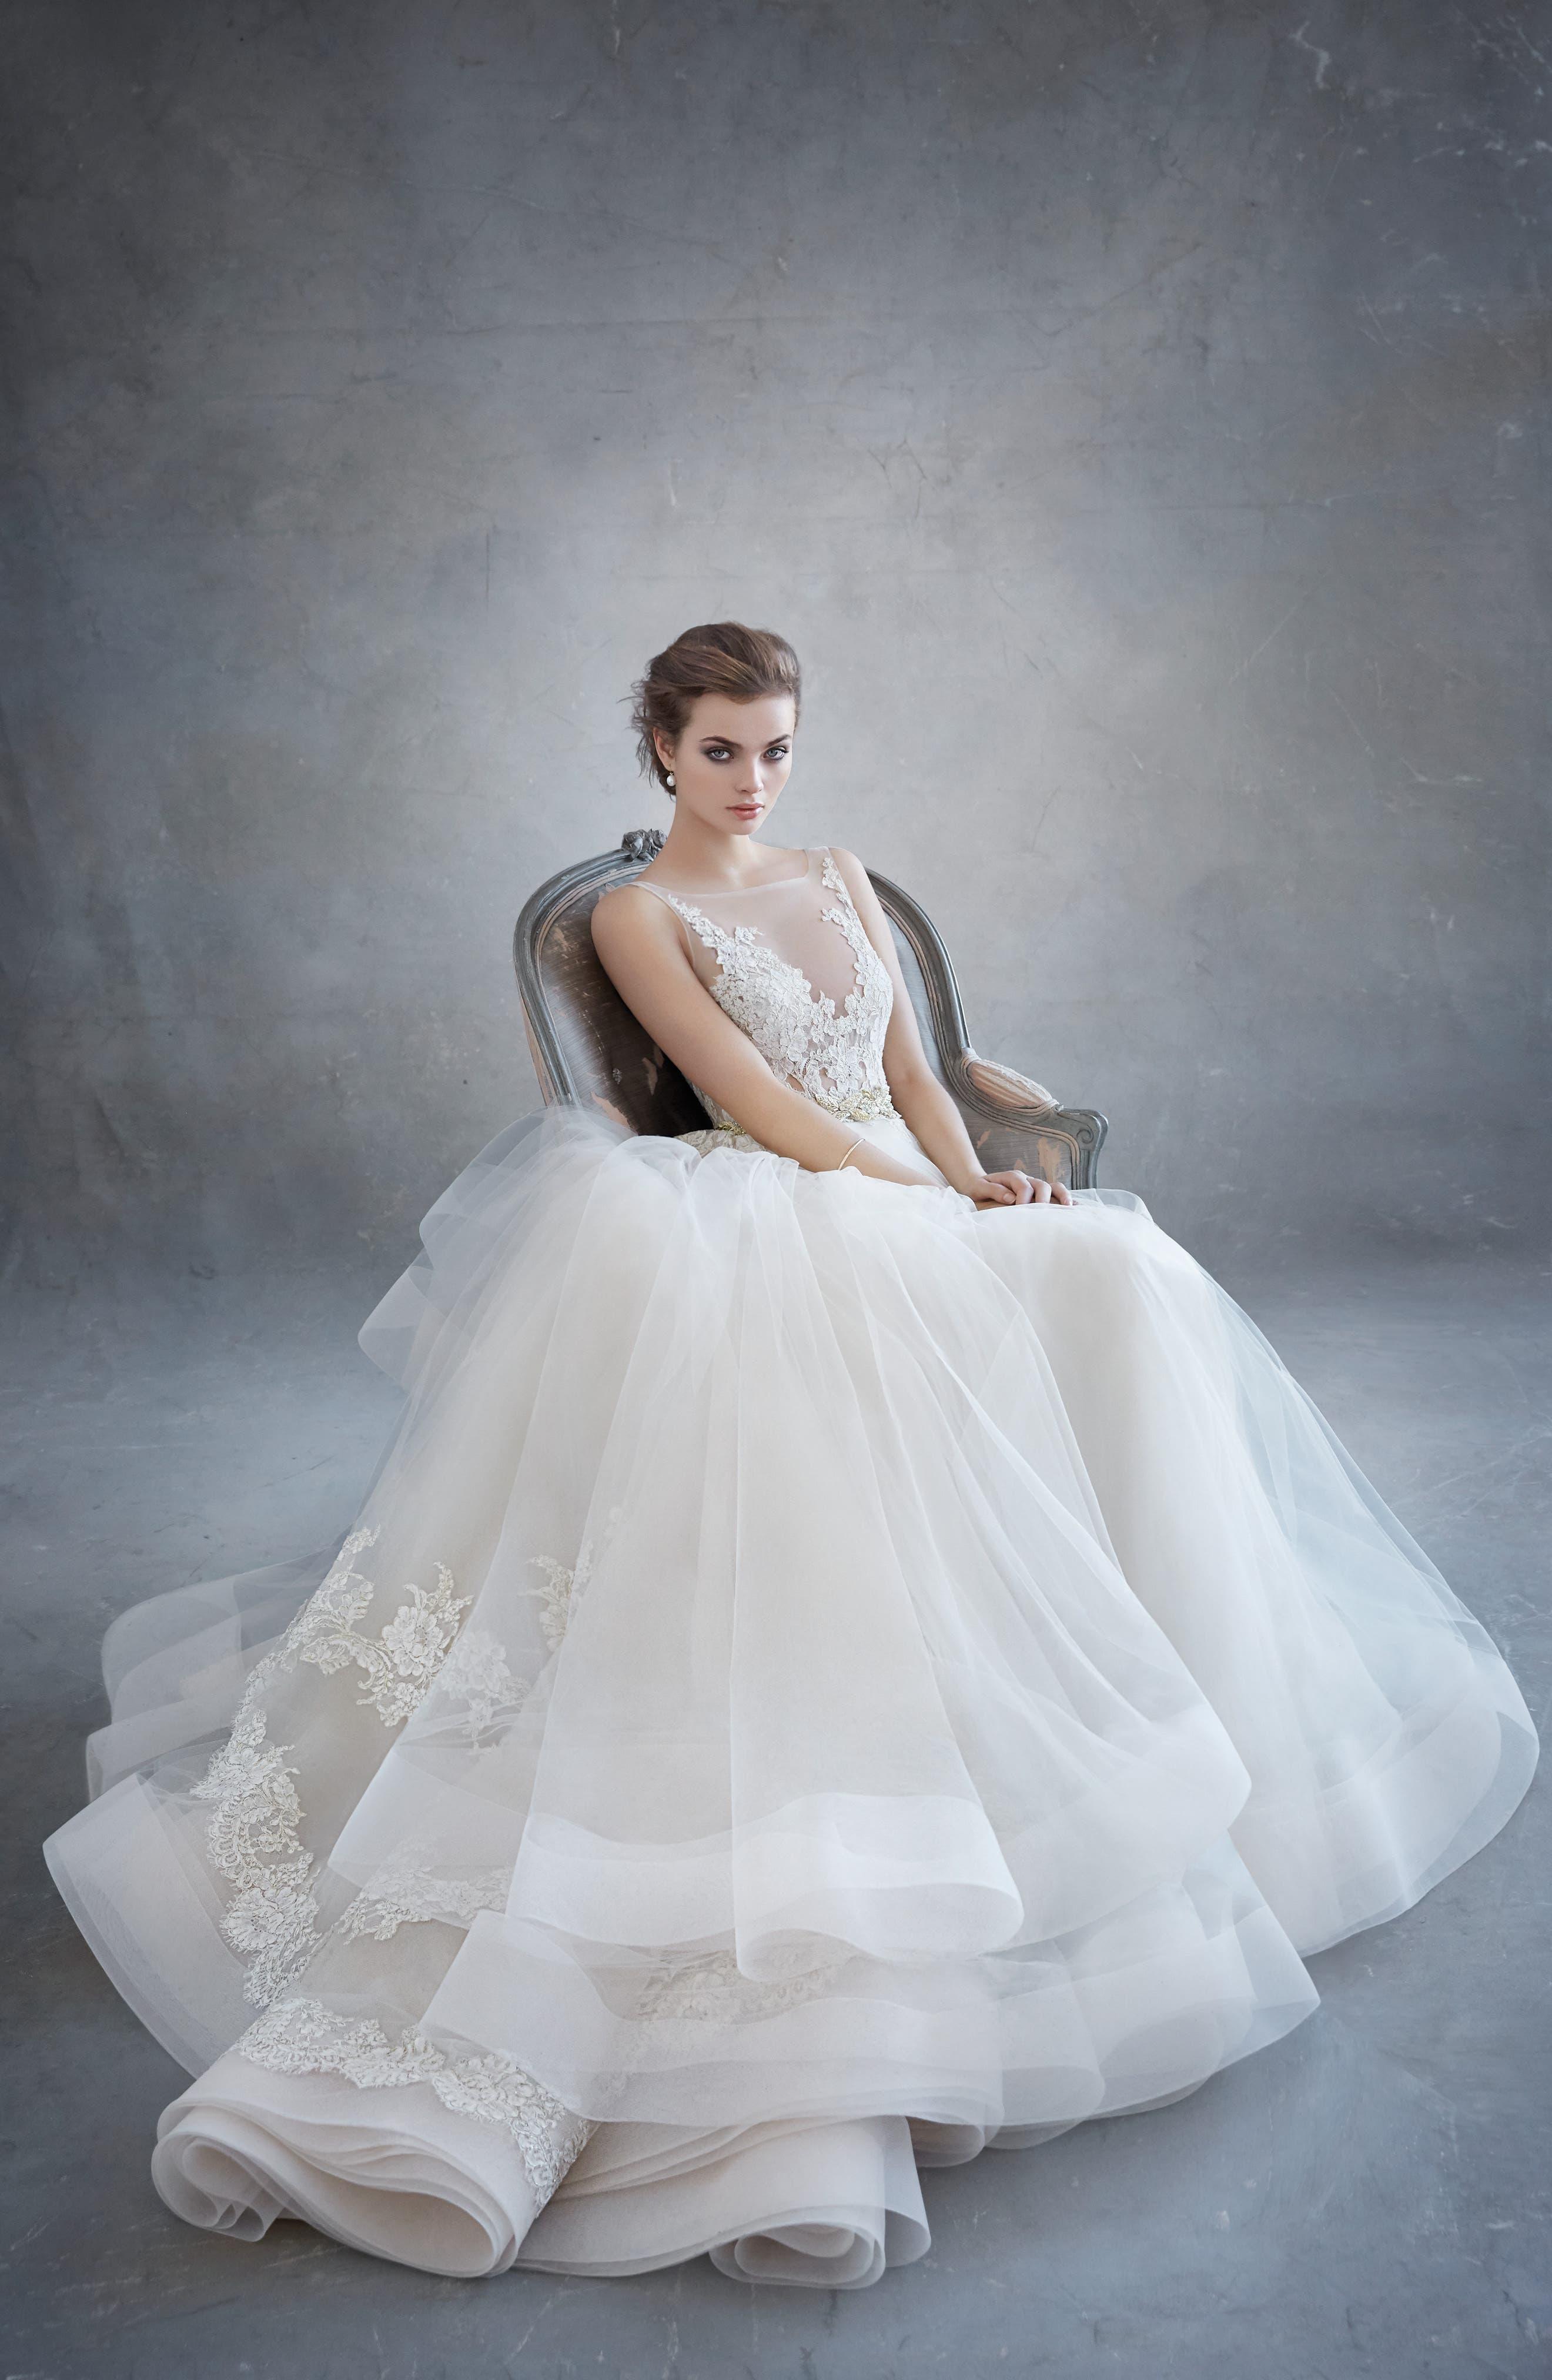 Lace Appliqué Tulle Ballgown Dress,                             Alternate thumbnail 6, color,                             IVORY/GOLD/CHAMPAGNE